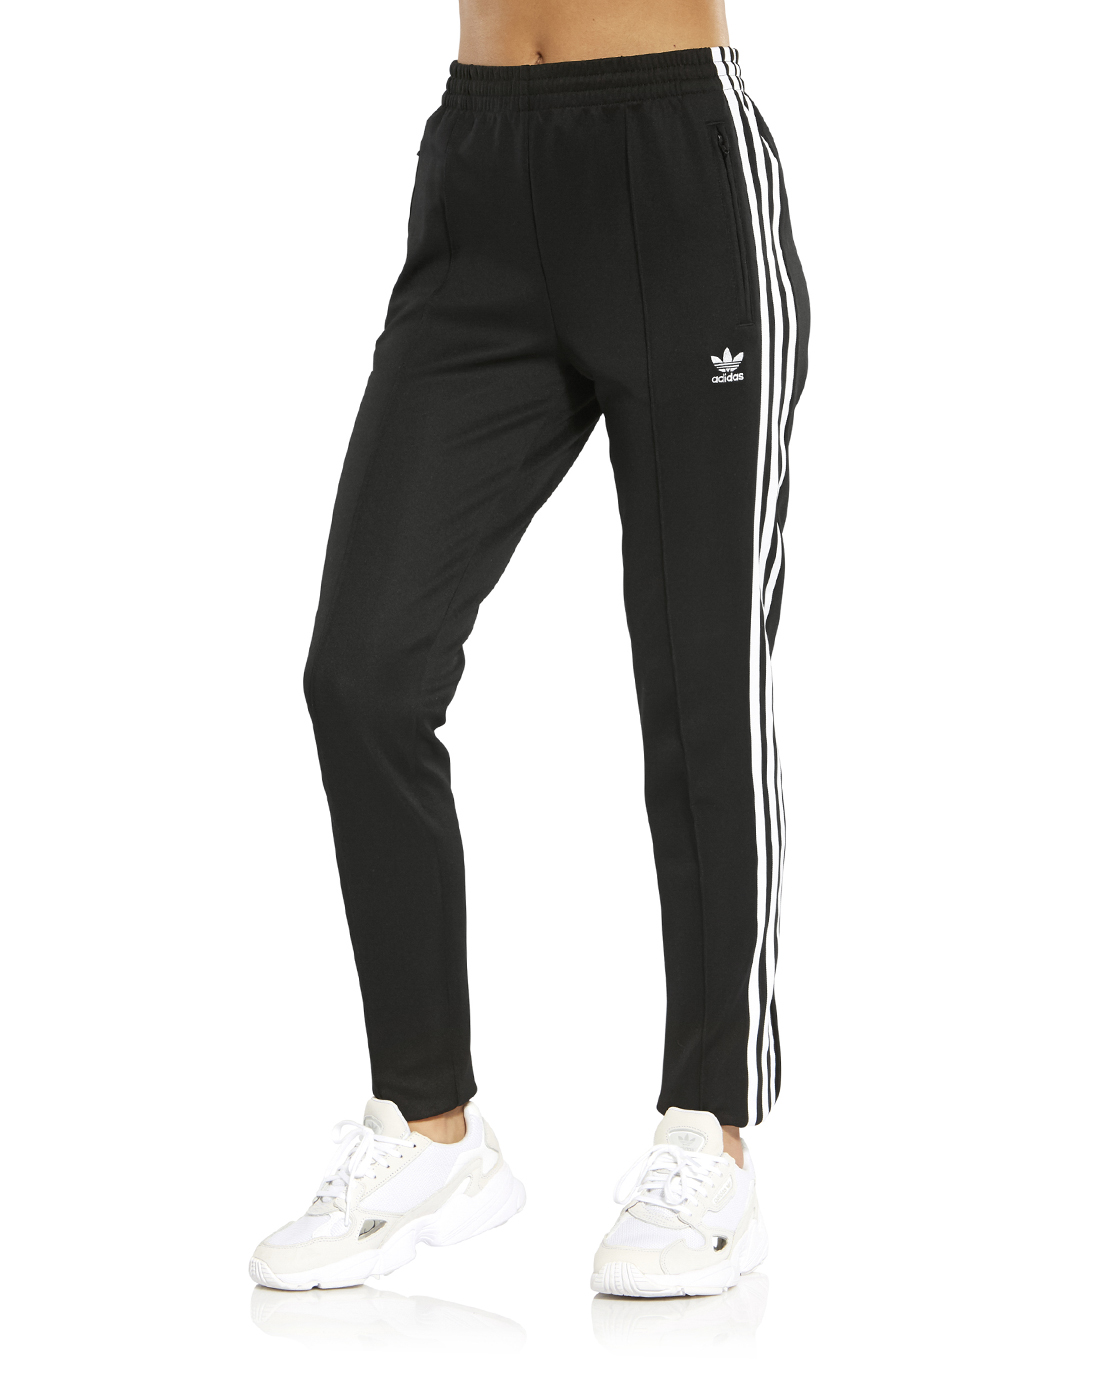 05b798d8bbc7ee adidas Originals Womens Superstar Track Pants | Life Style Sports